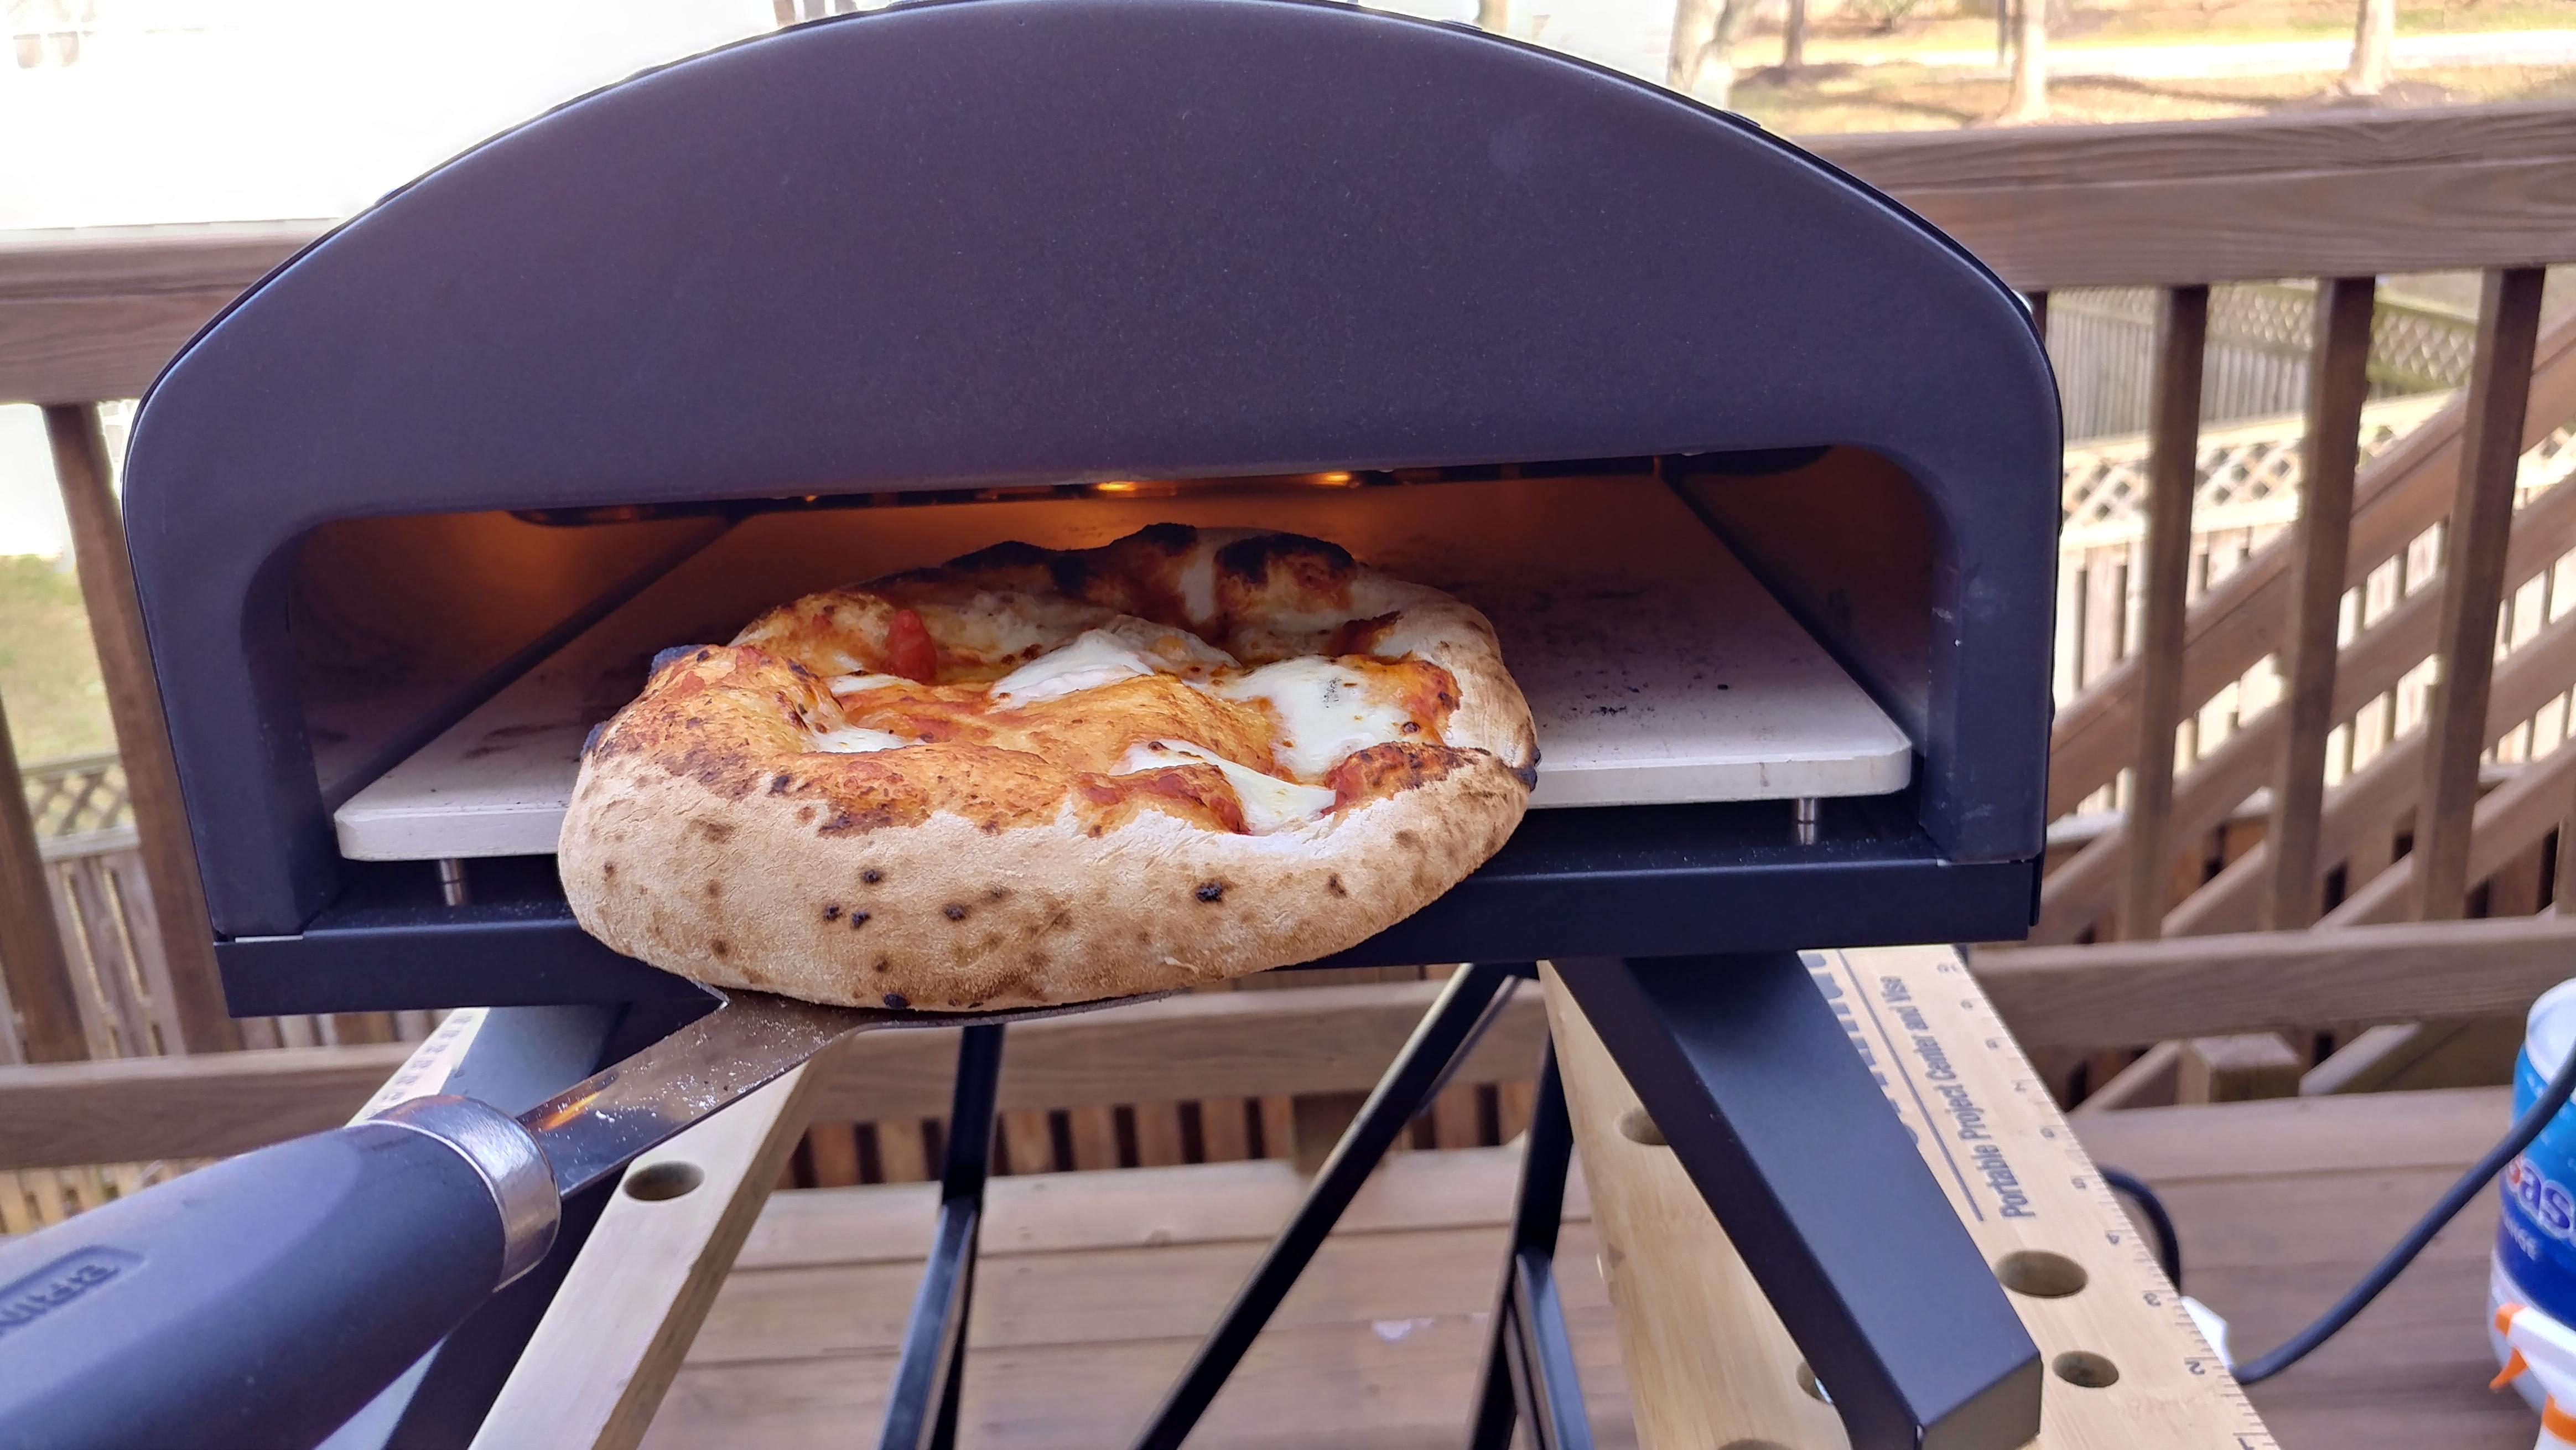 Napoli Neapolitan Outdoor Pizza Oven $210 shipped